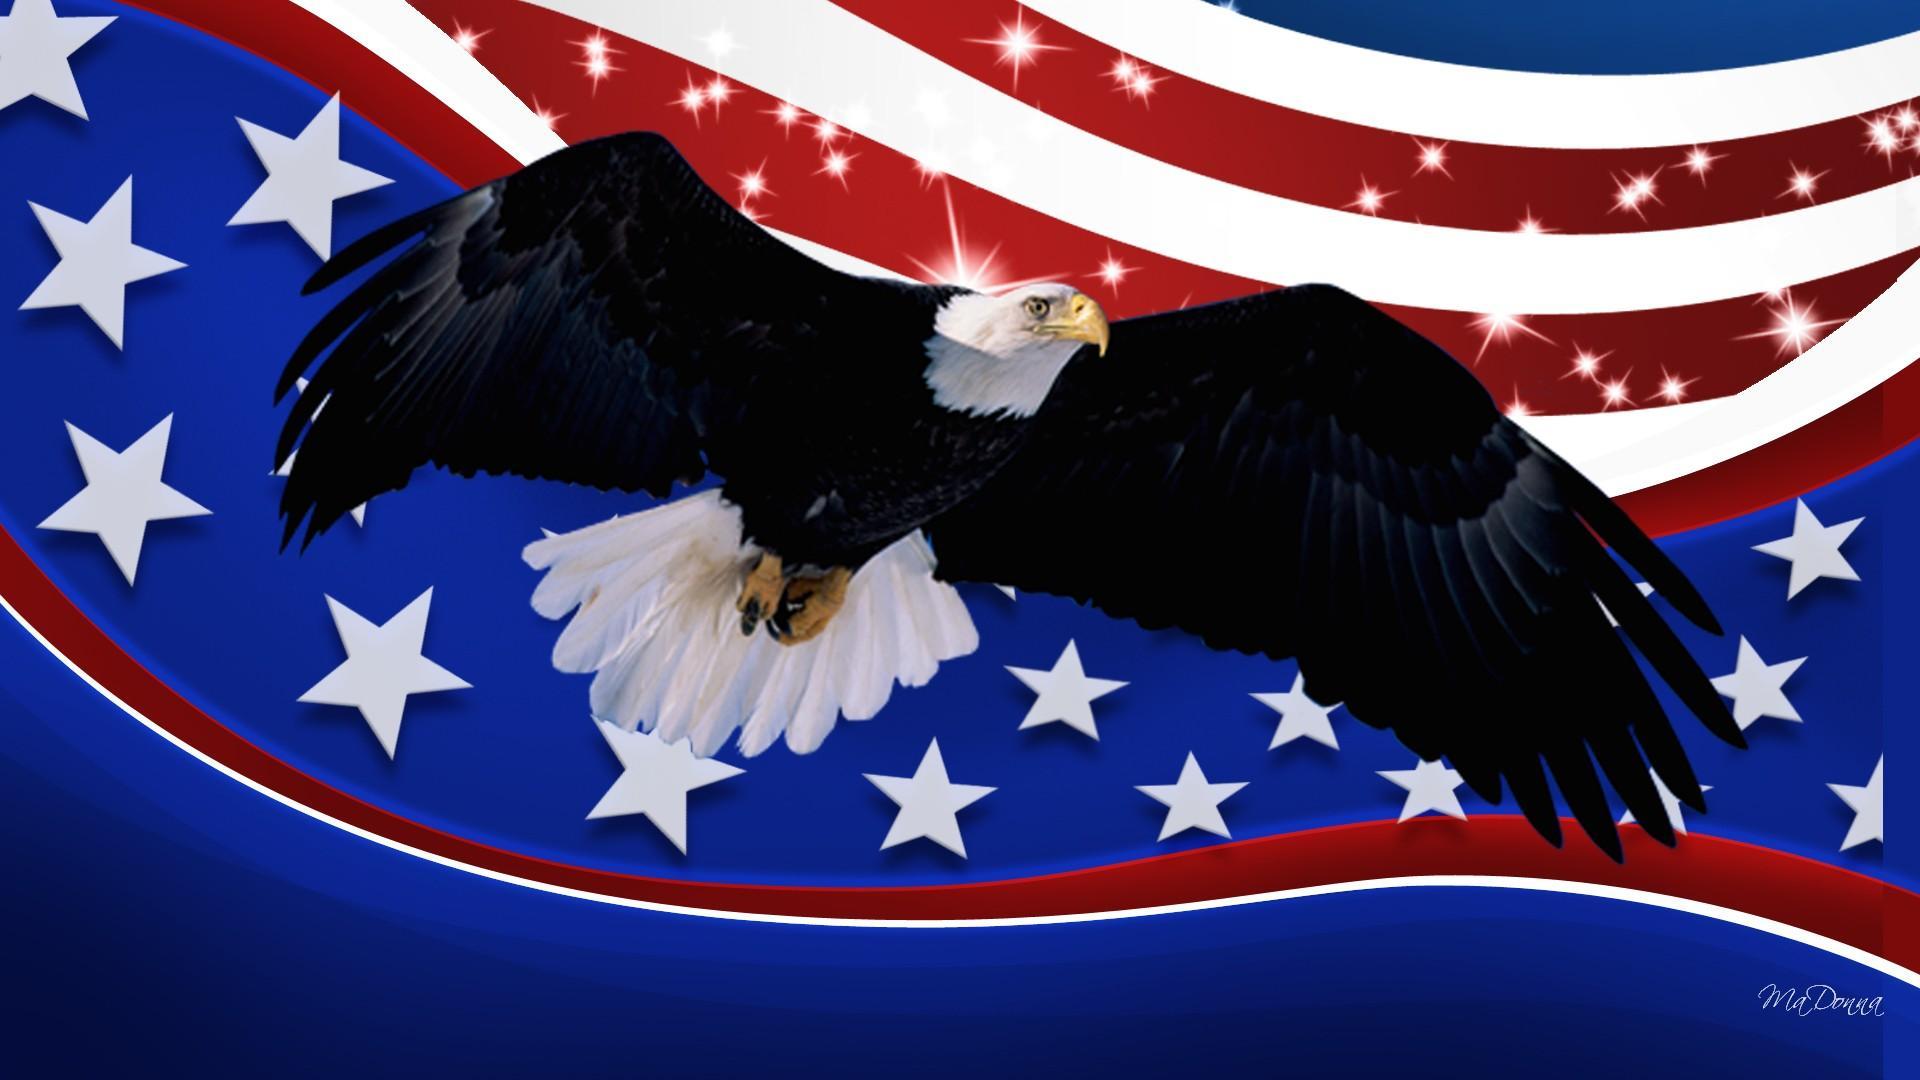 Veterans Day HD Desktop Wallpapers For Widescreen High Definition